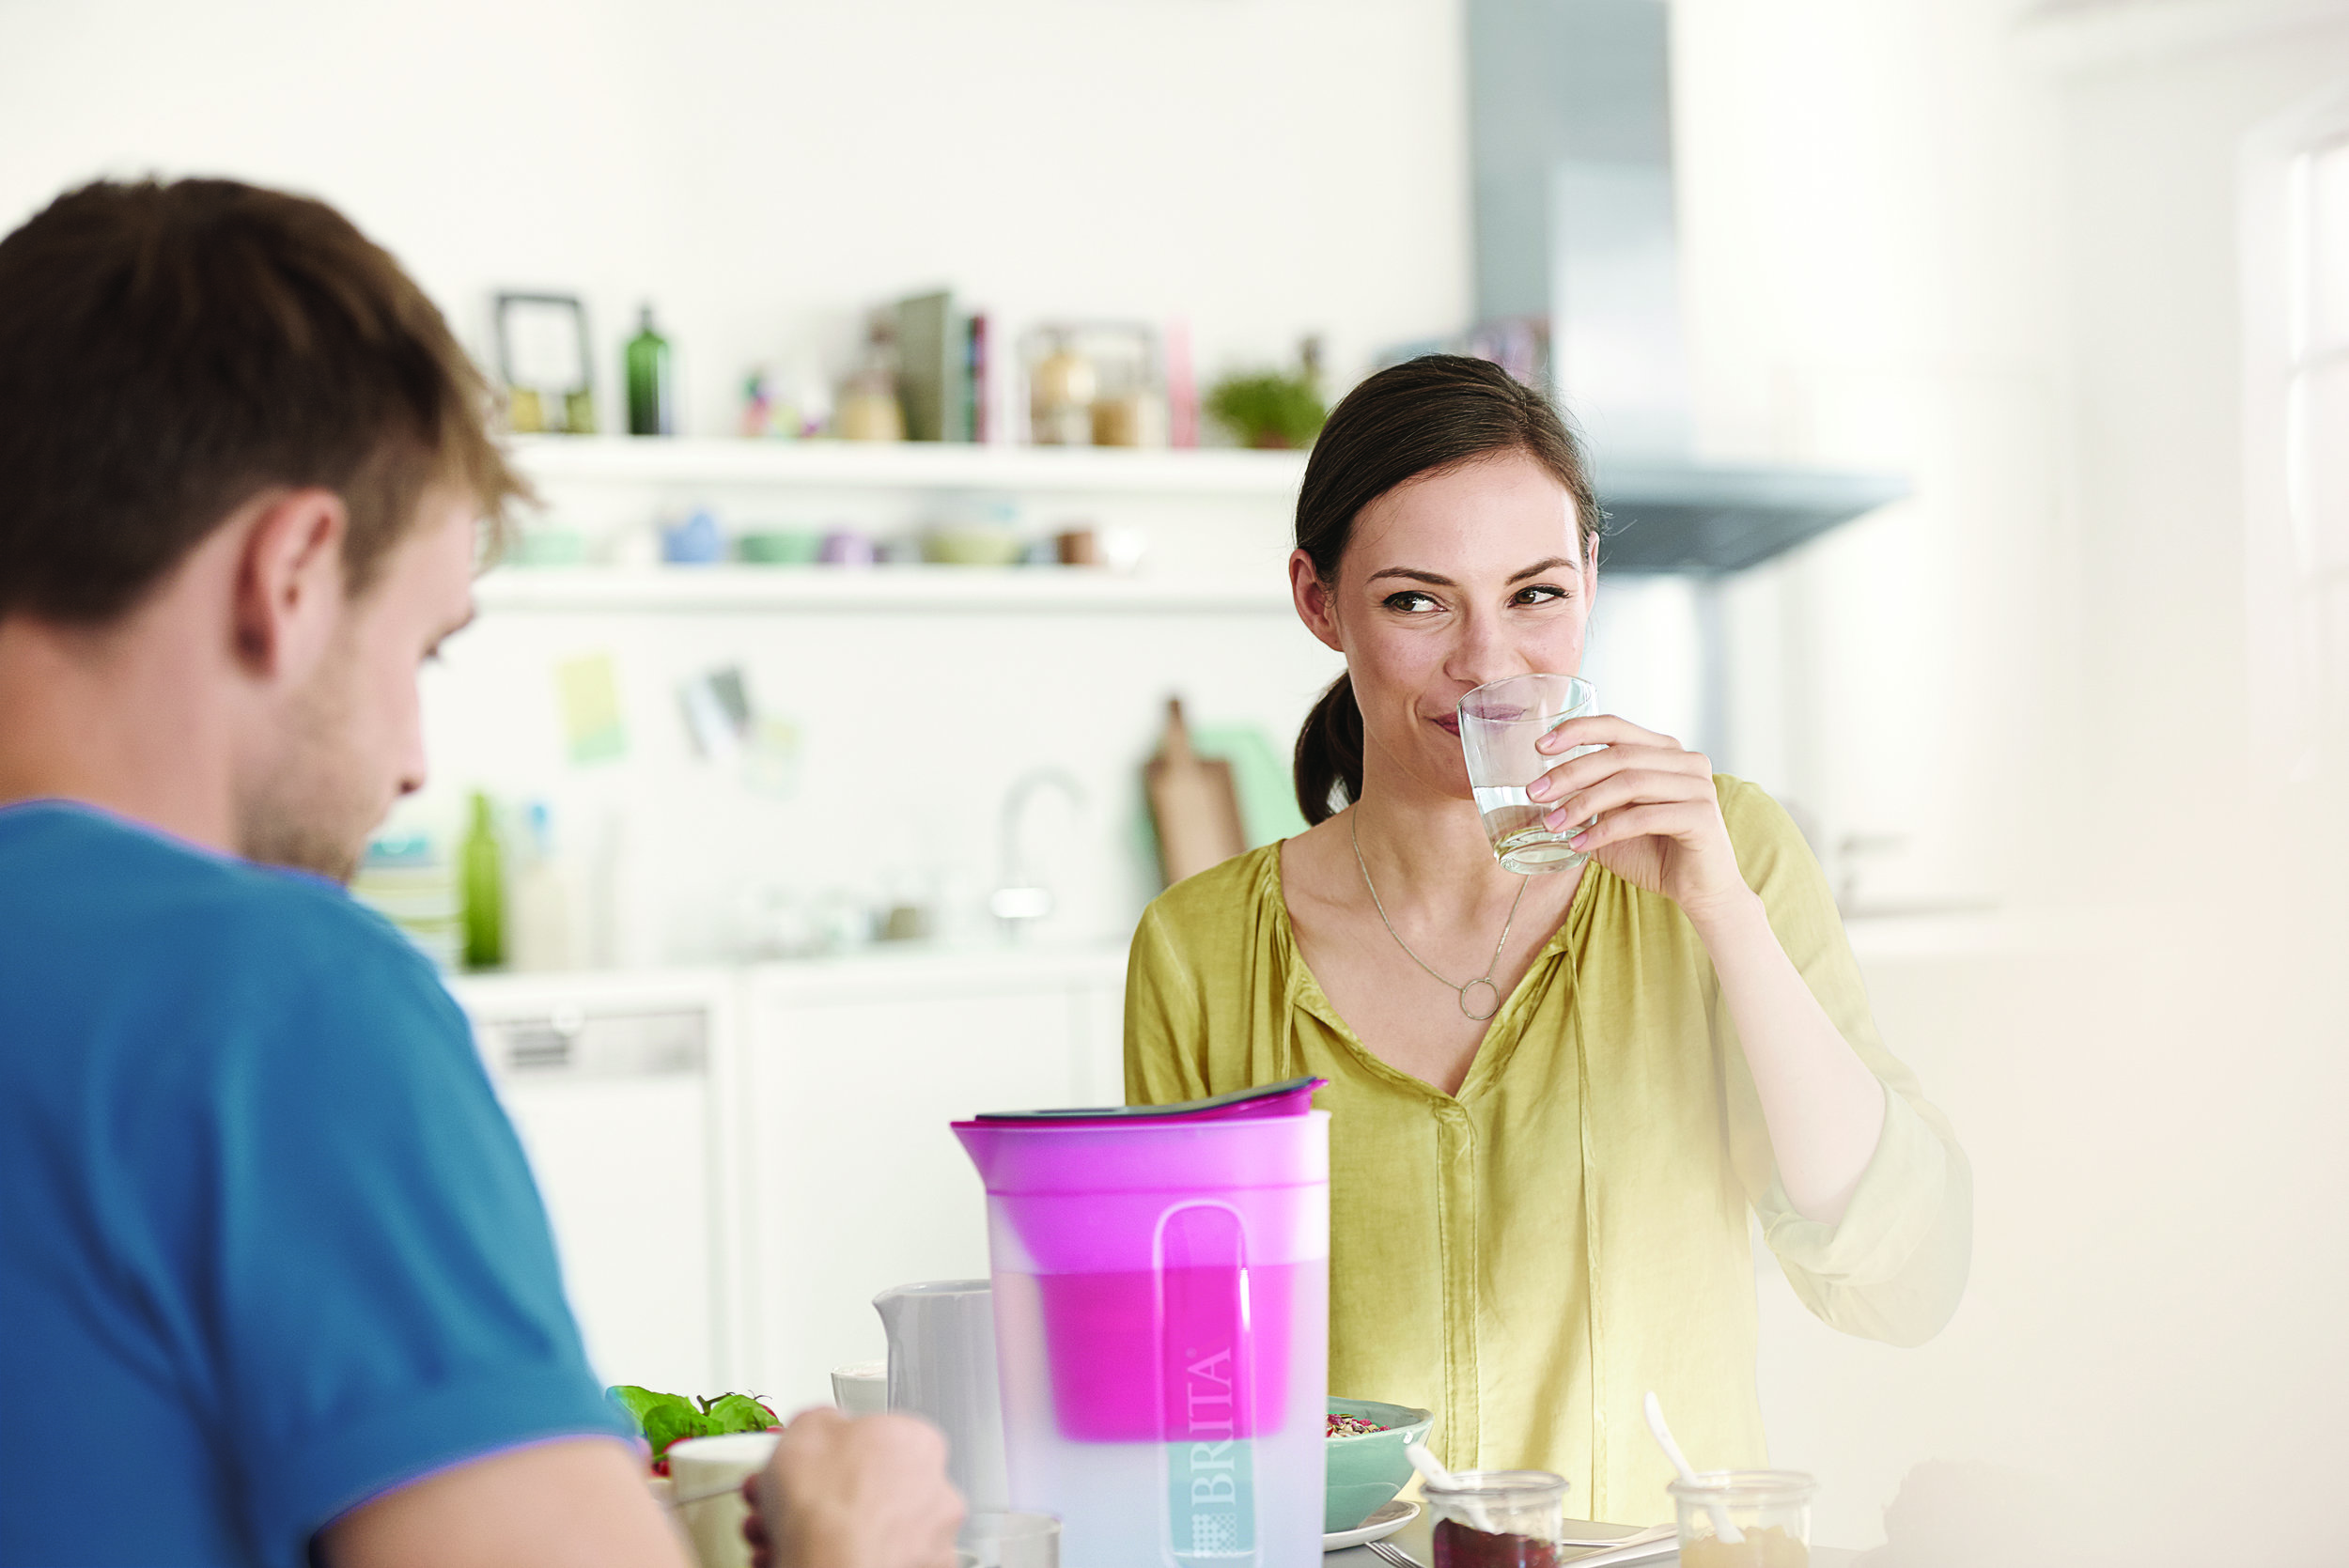 16_FE_Fun_POS_pink_kitchen_couple_breakfast.jpg